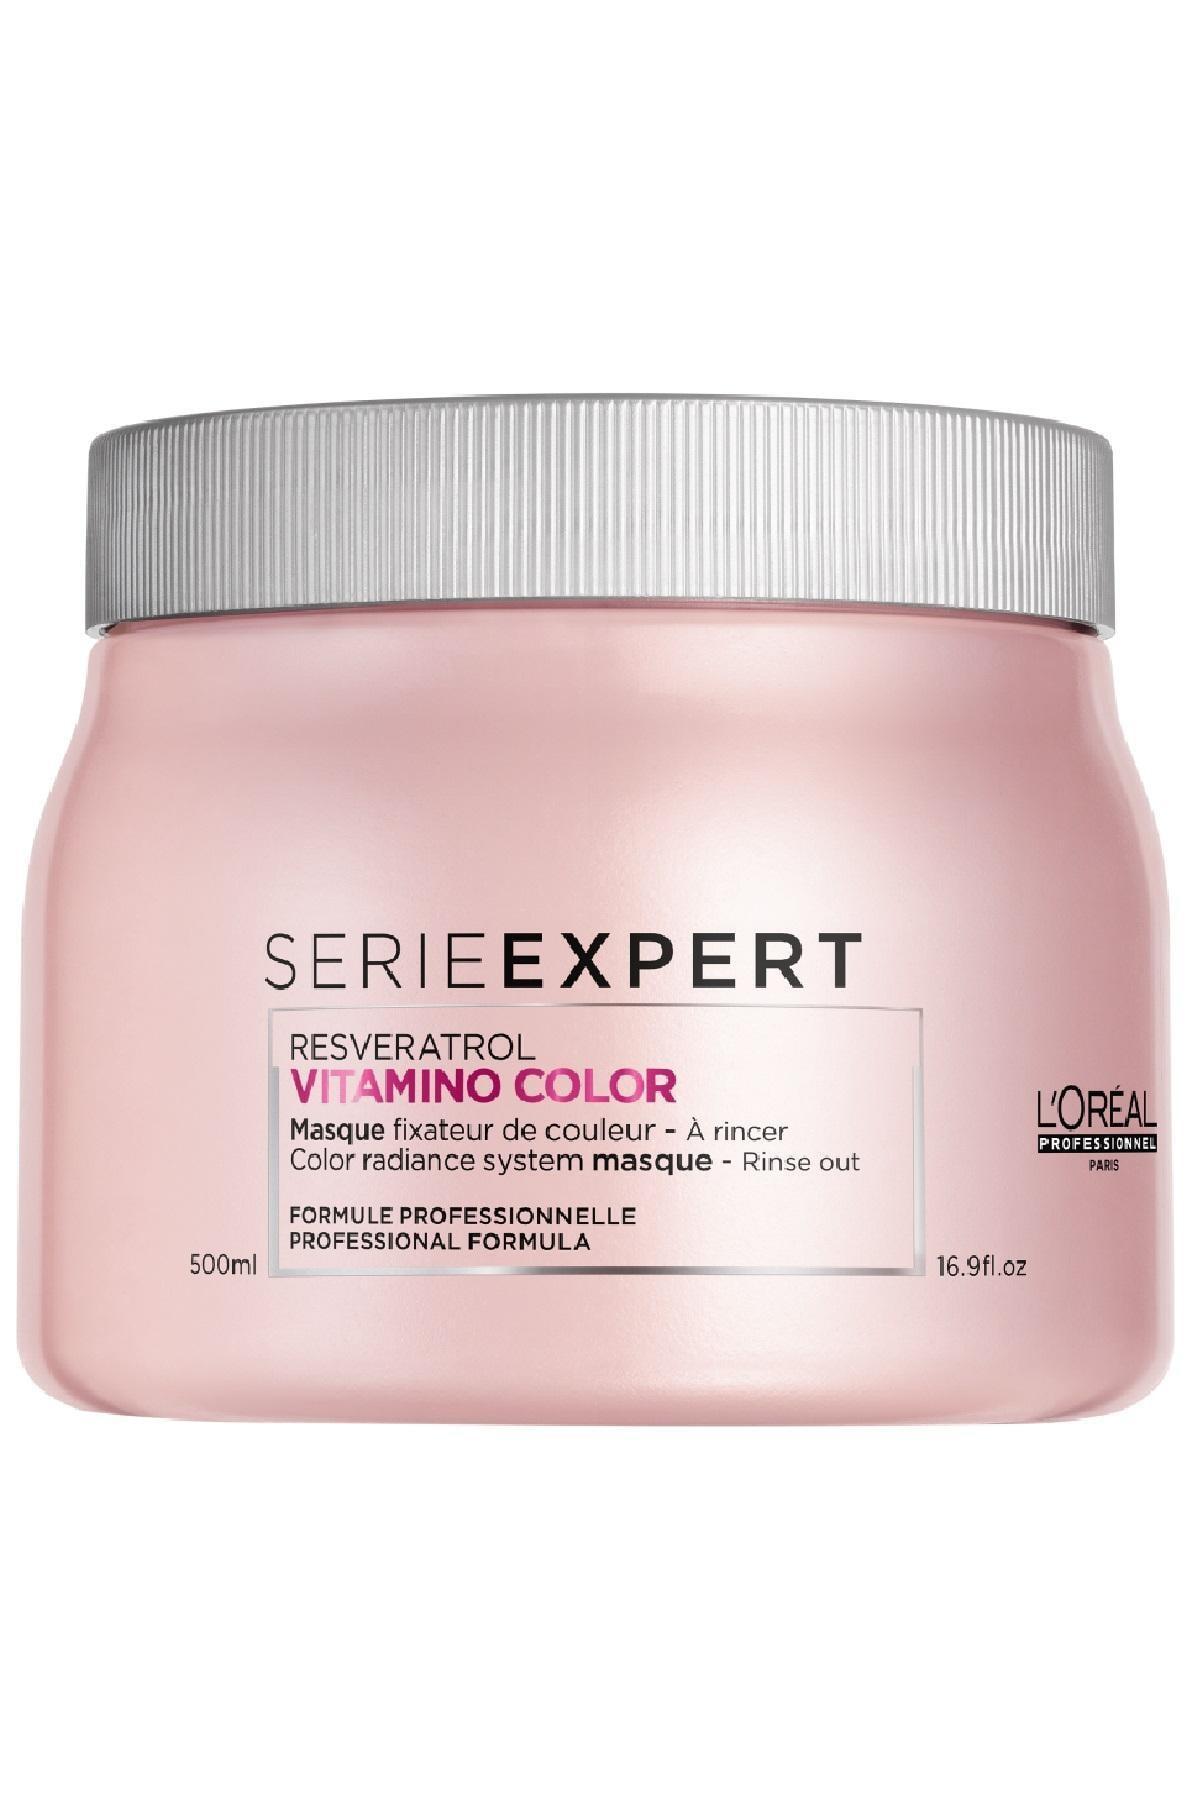 L'oreal Professionnel Loreal Serie Expert Vitamino Color Resveratrol Maskesi 500 ml. 1